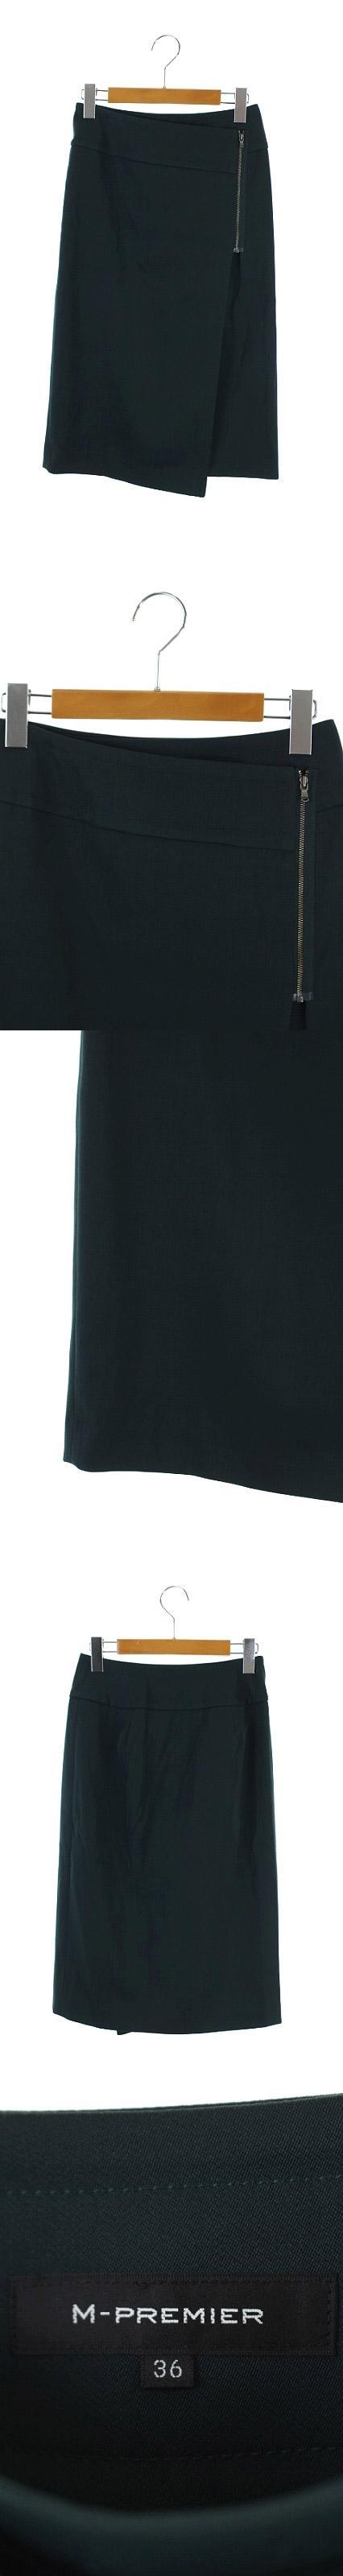 17AW スカート ラップ ロング タイト ジップ 36 モスグリーン 深緑 /ES ■OS